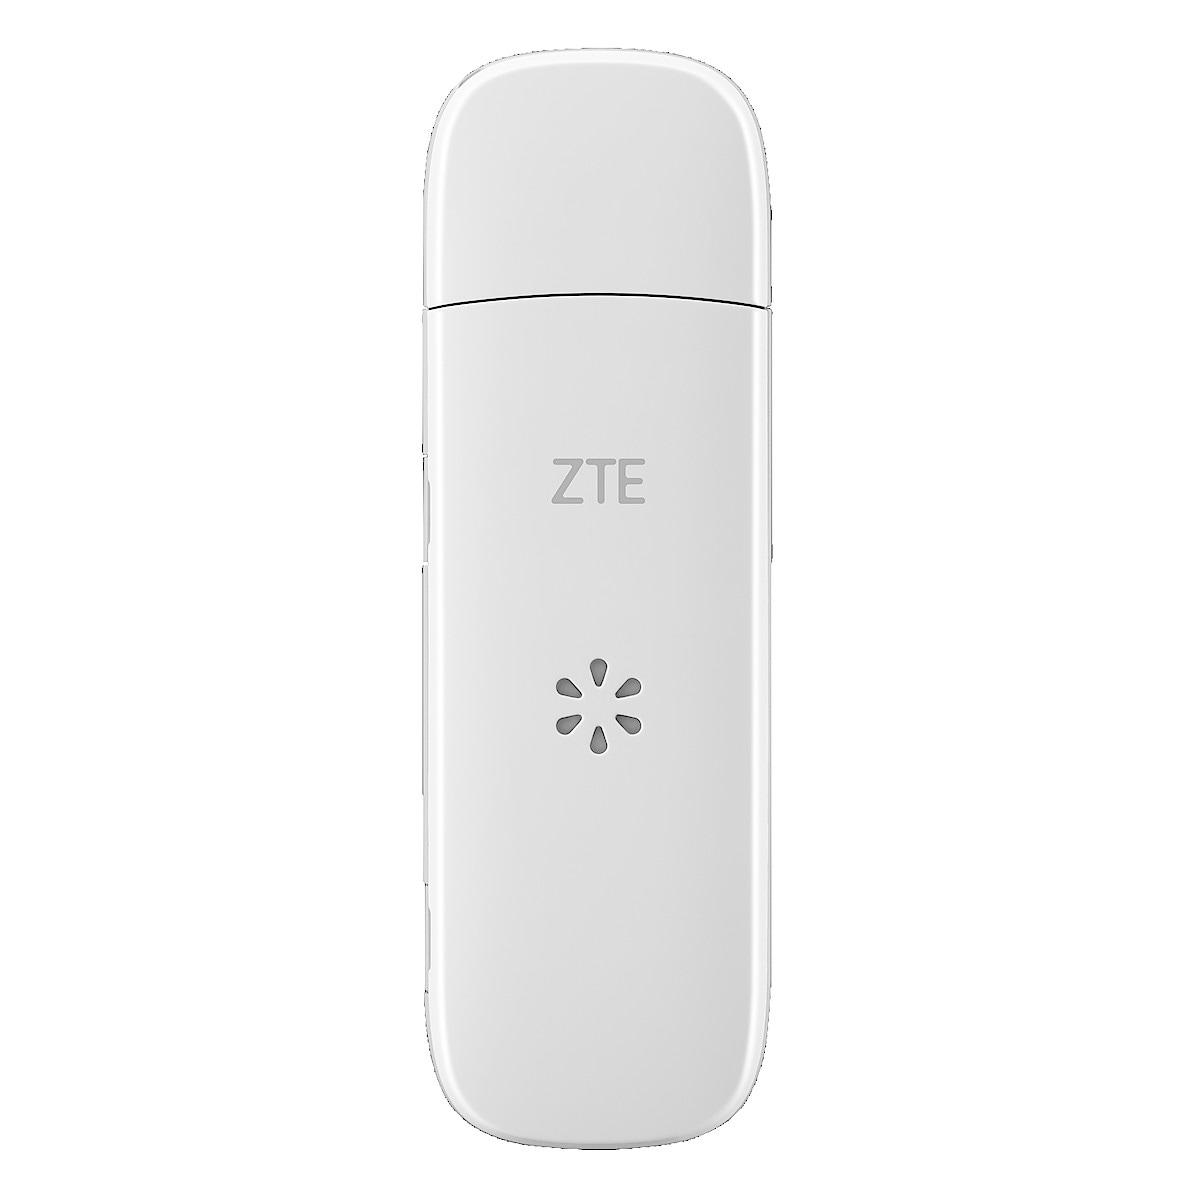 ZTE Mobilt 4G-modem